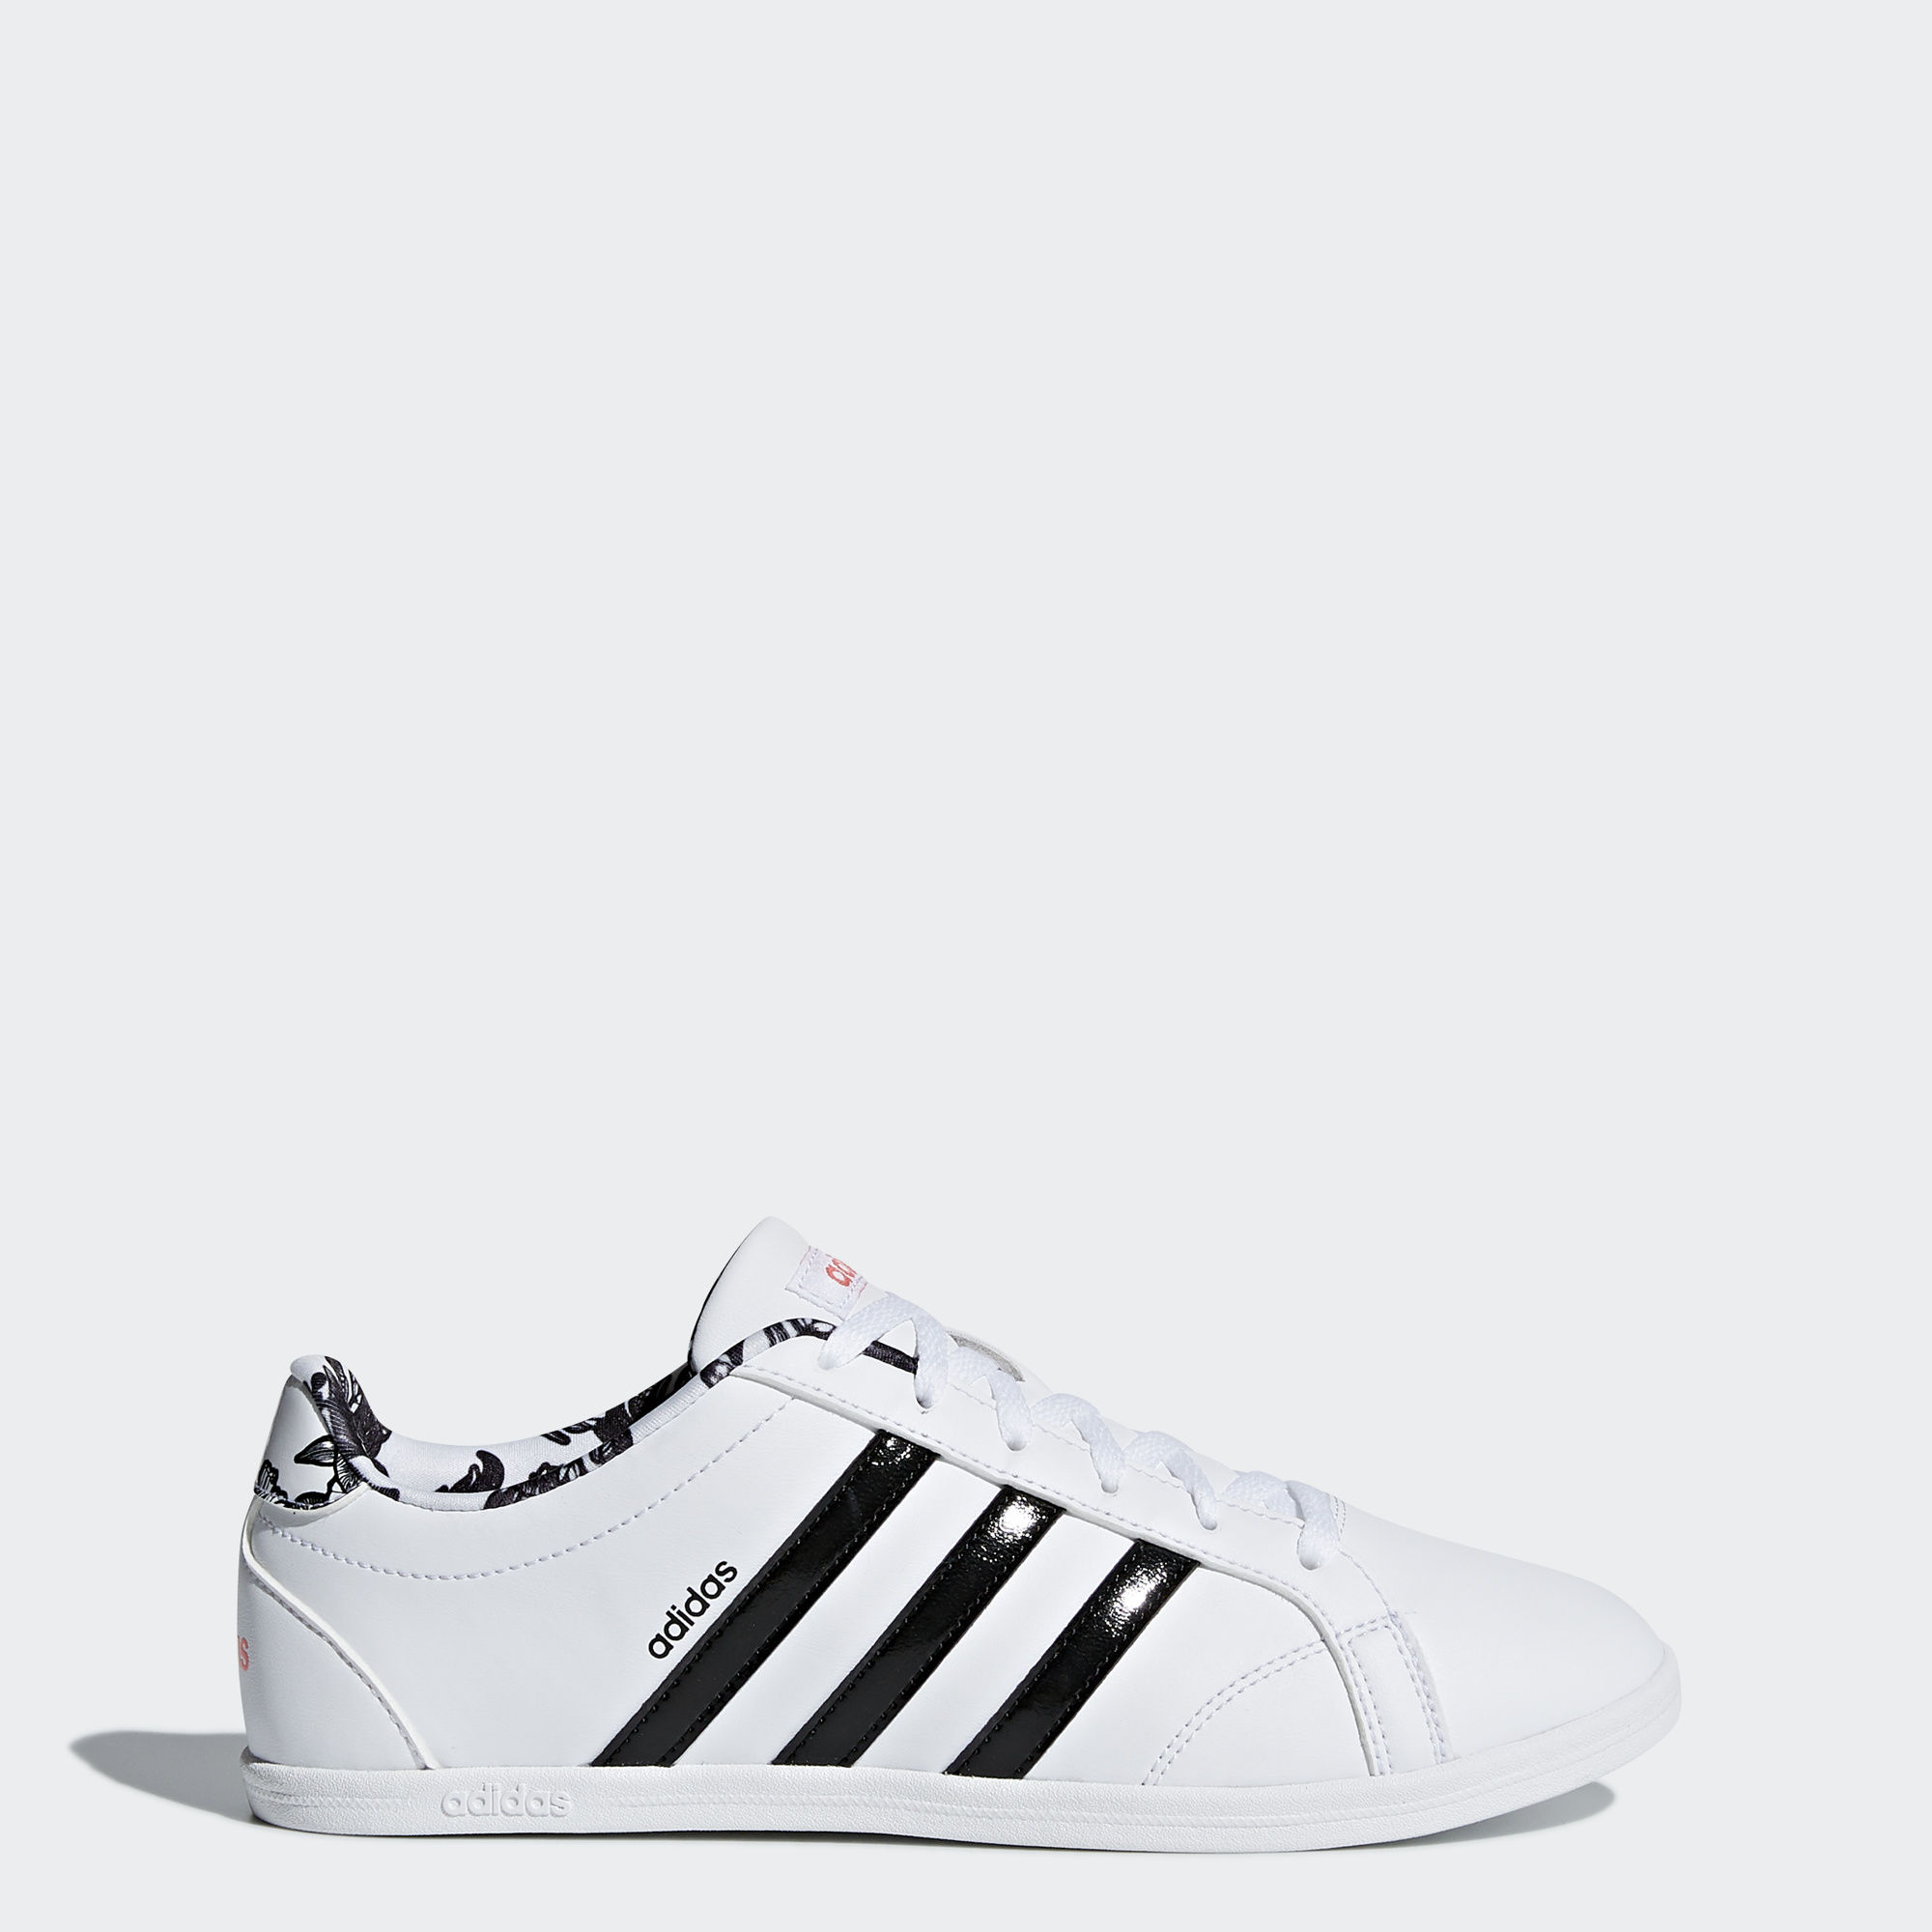 adidas neo noir et blanc femme